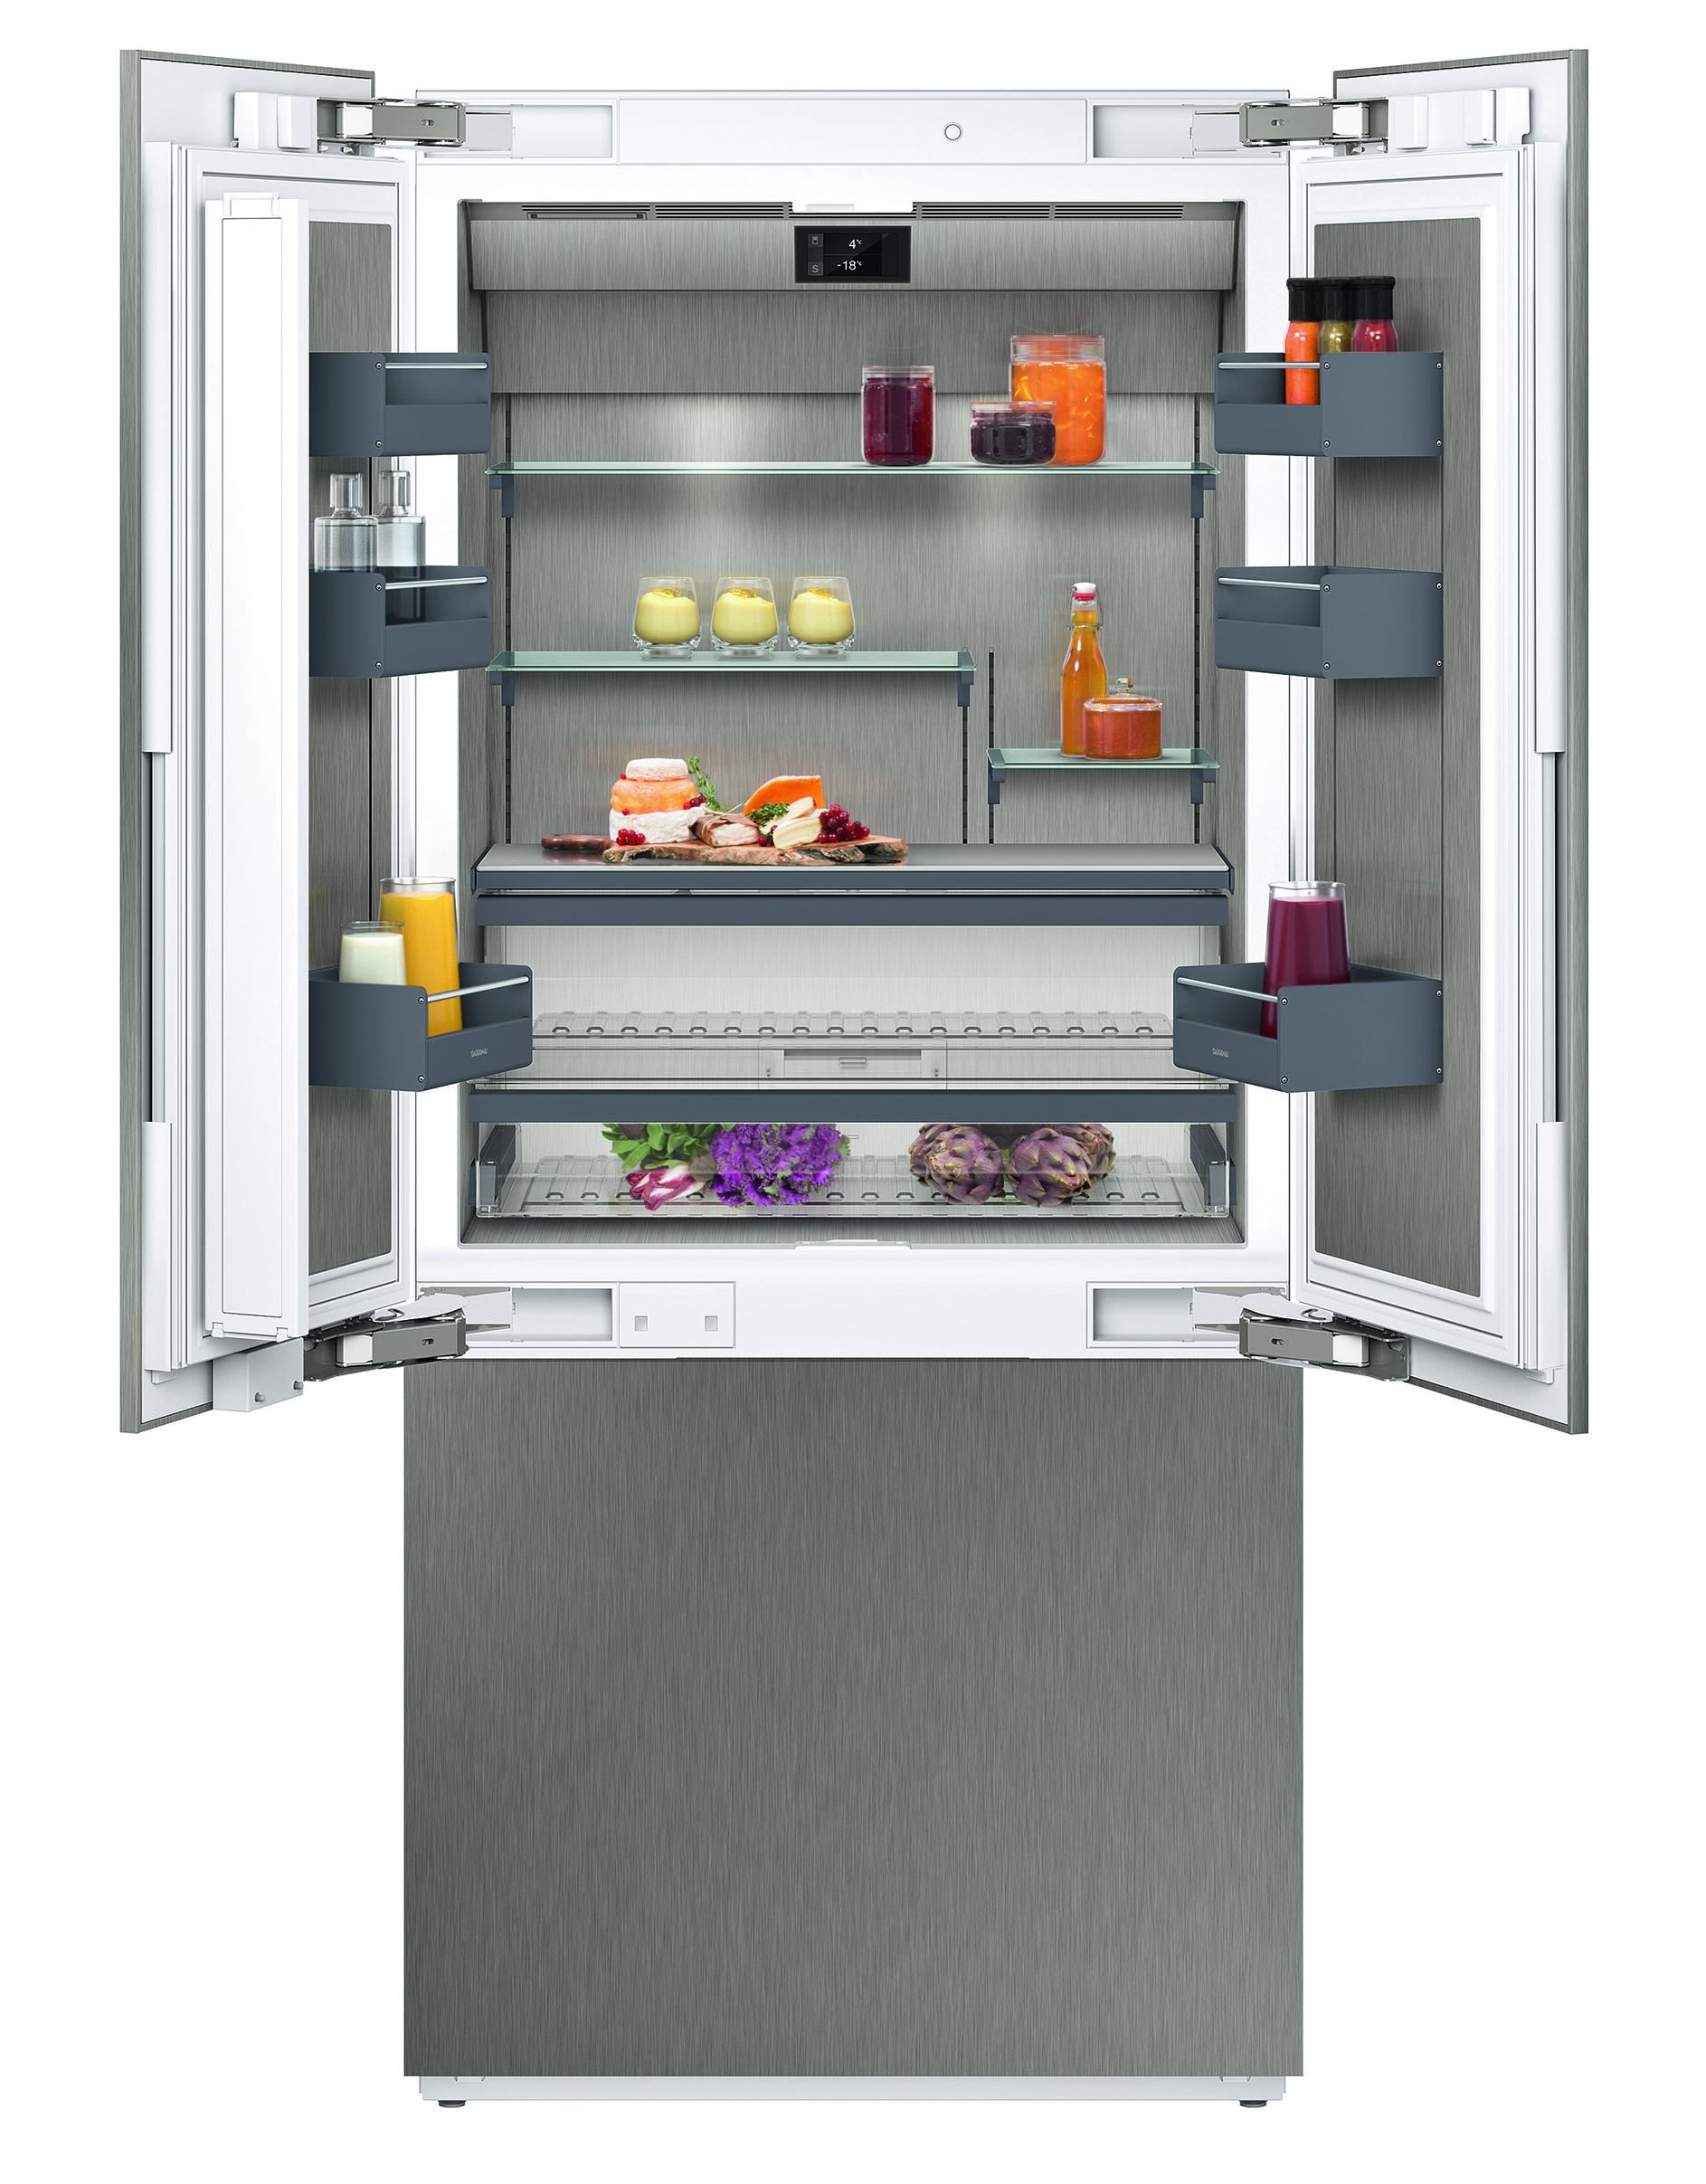 Gaggenau Vario fridge and freezer combination